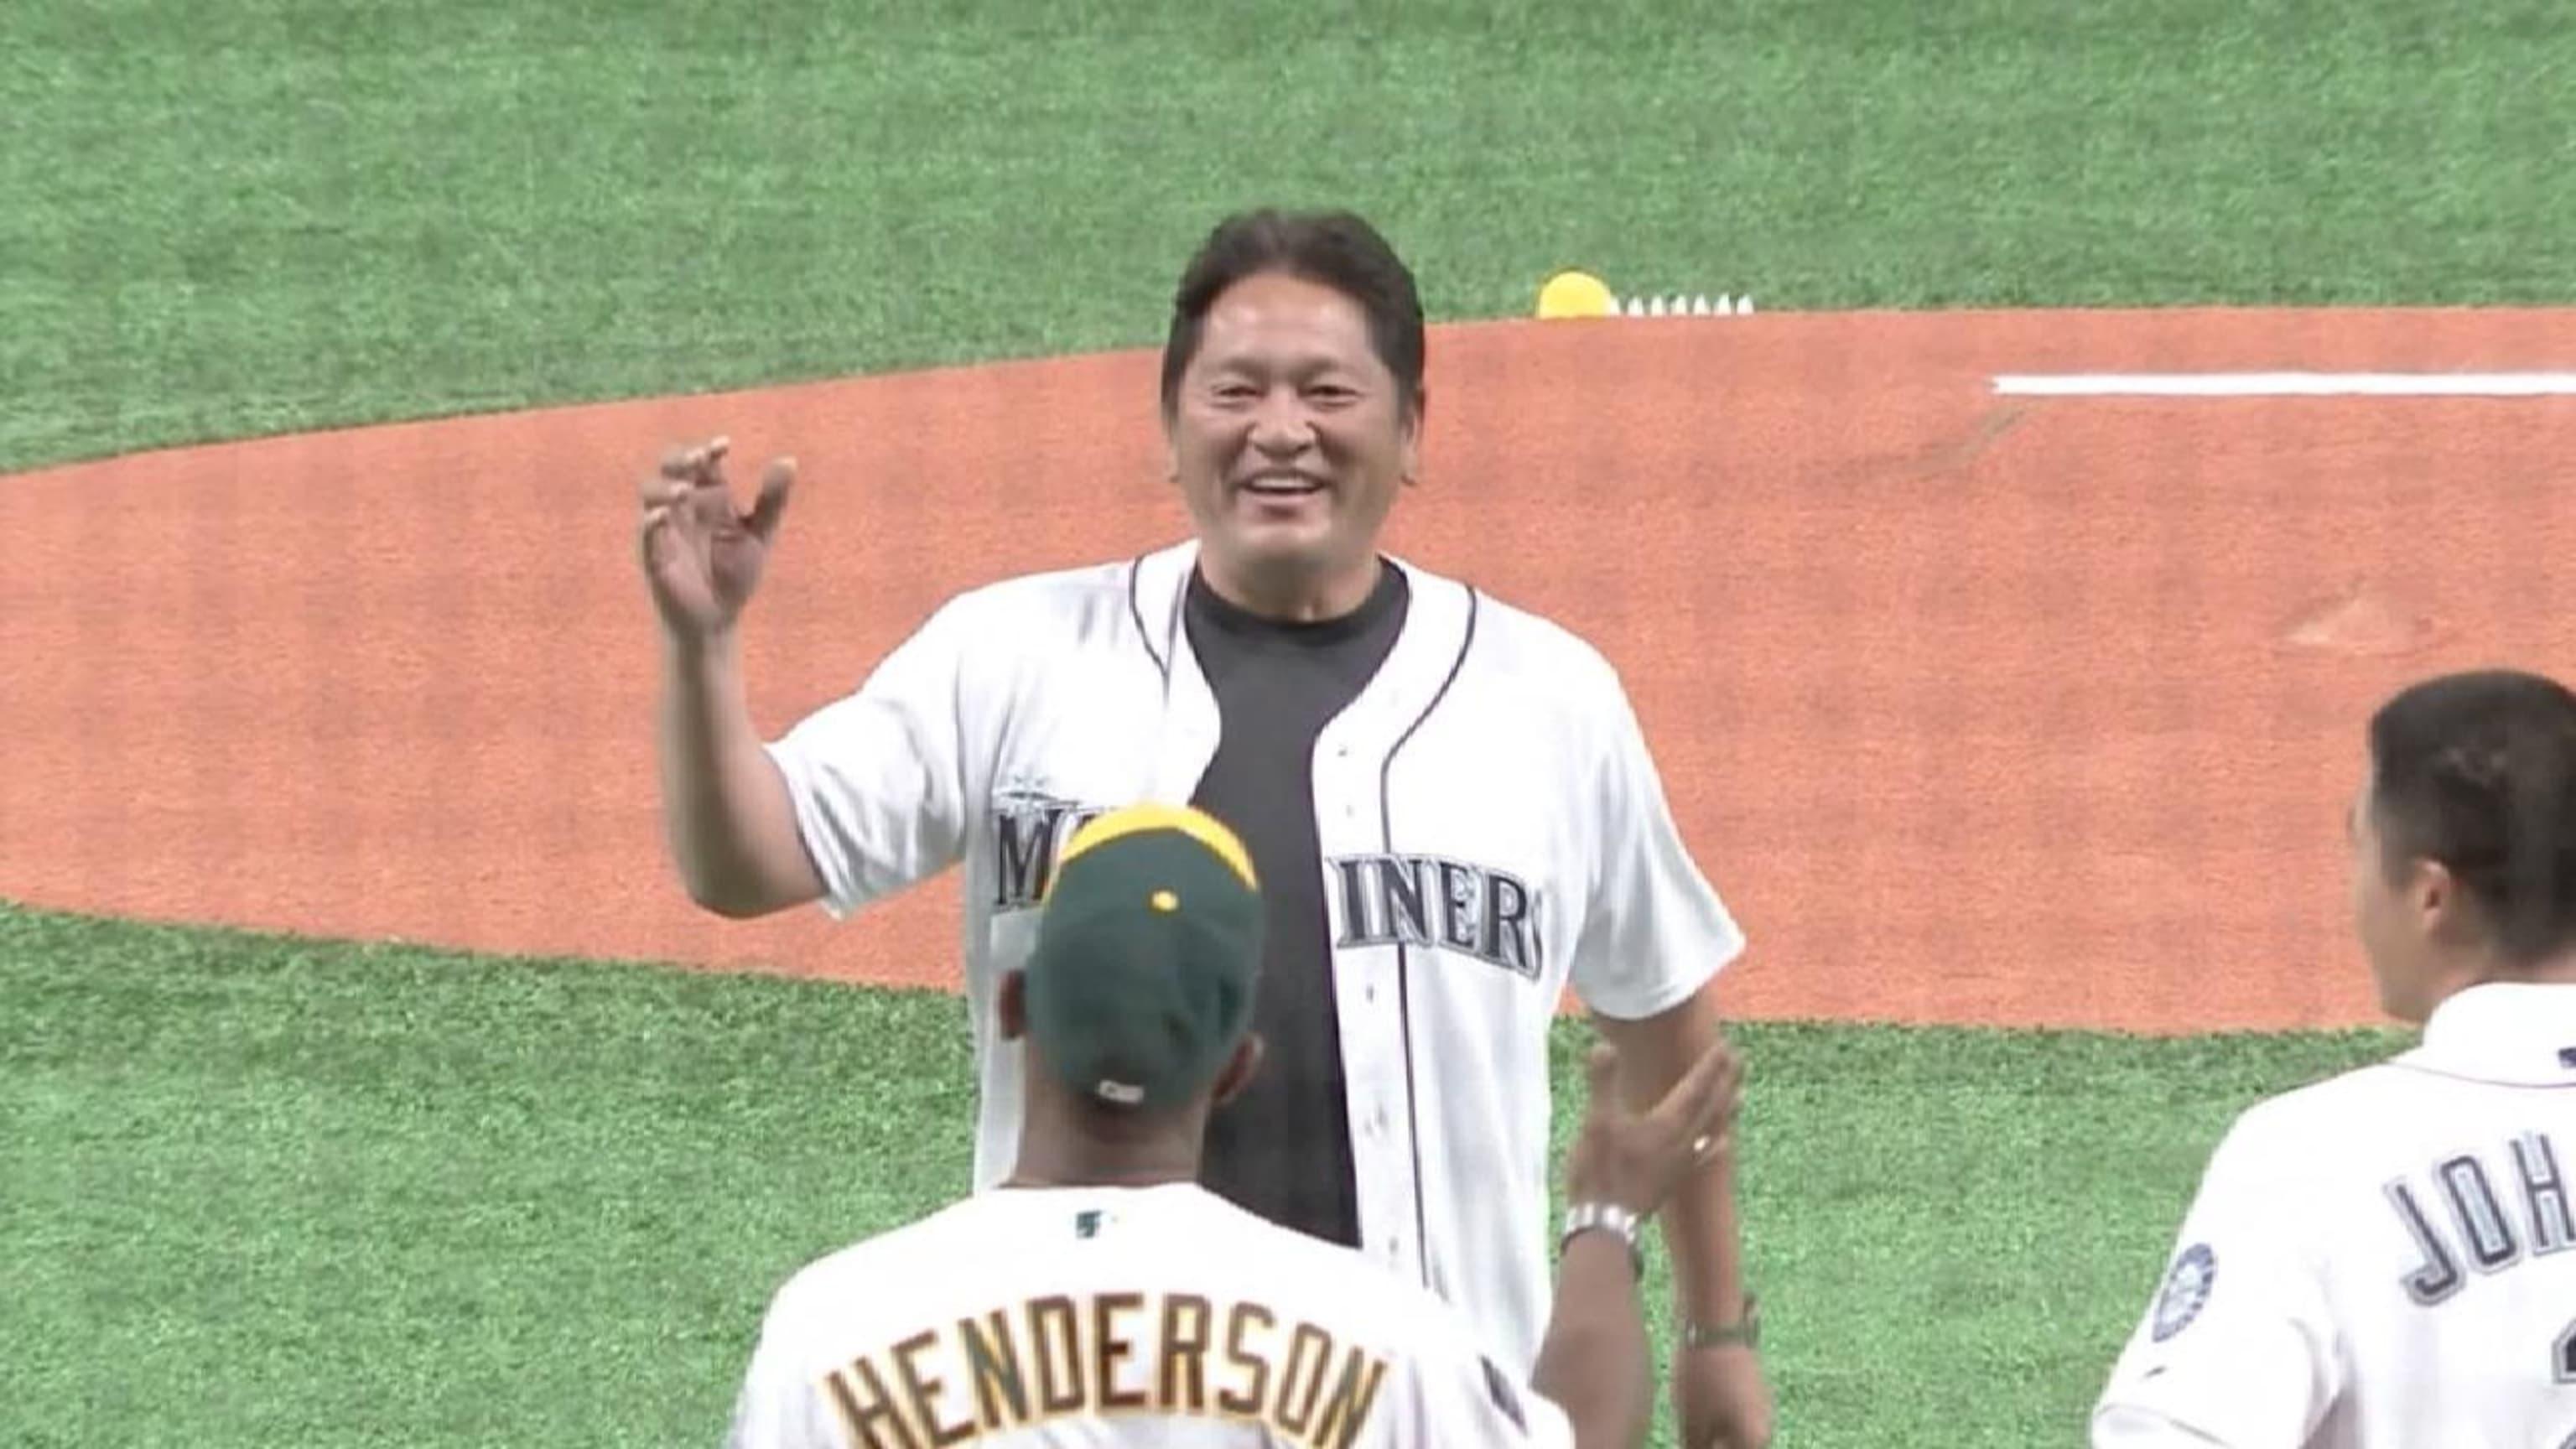 Sasaki's first pitch